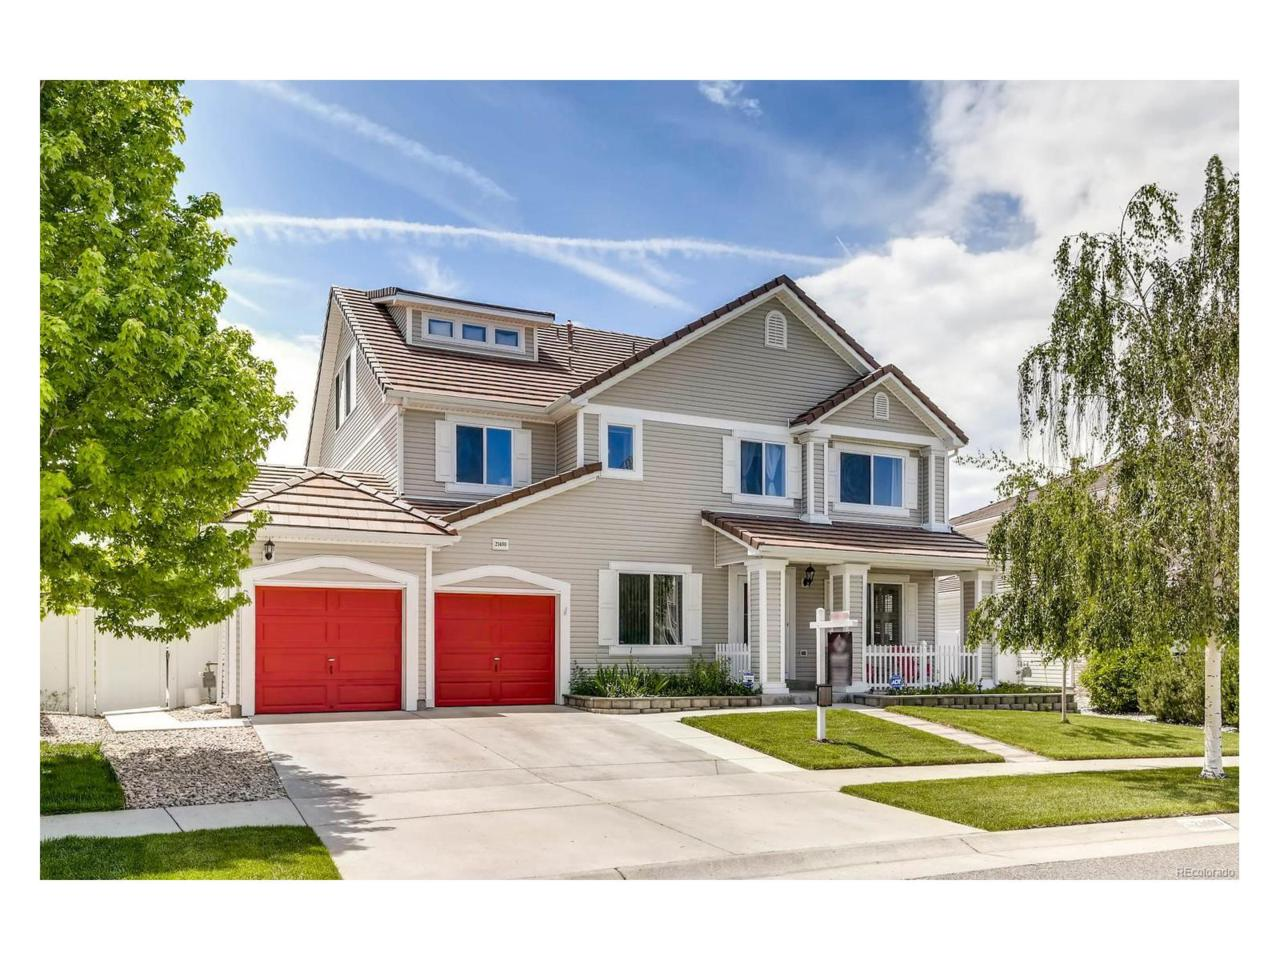 21400 Stoll Place, Denver, CO 80249 (MLS #5786702) :: 8z Real Estate